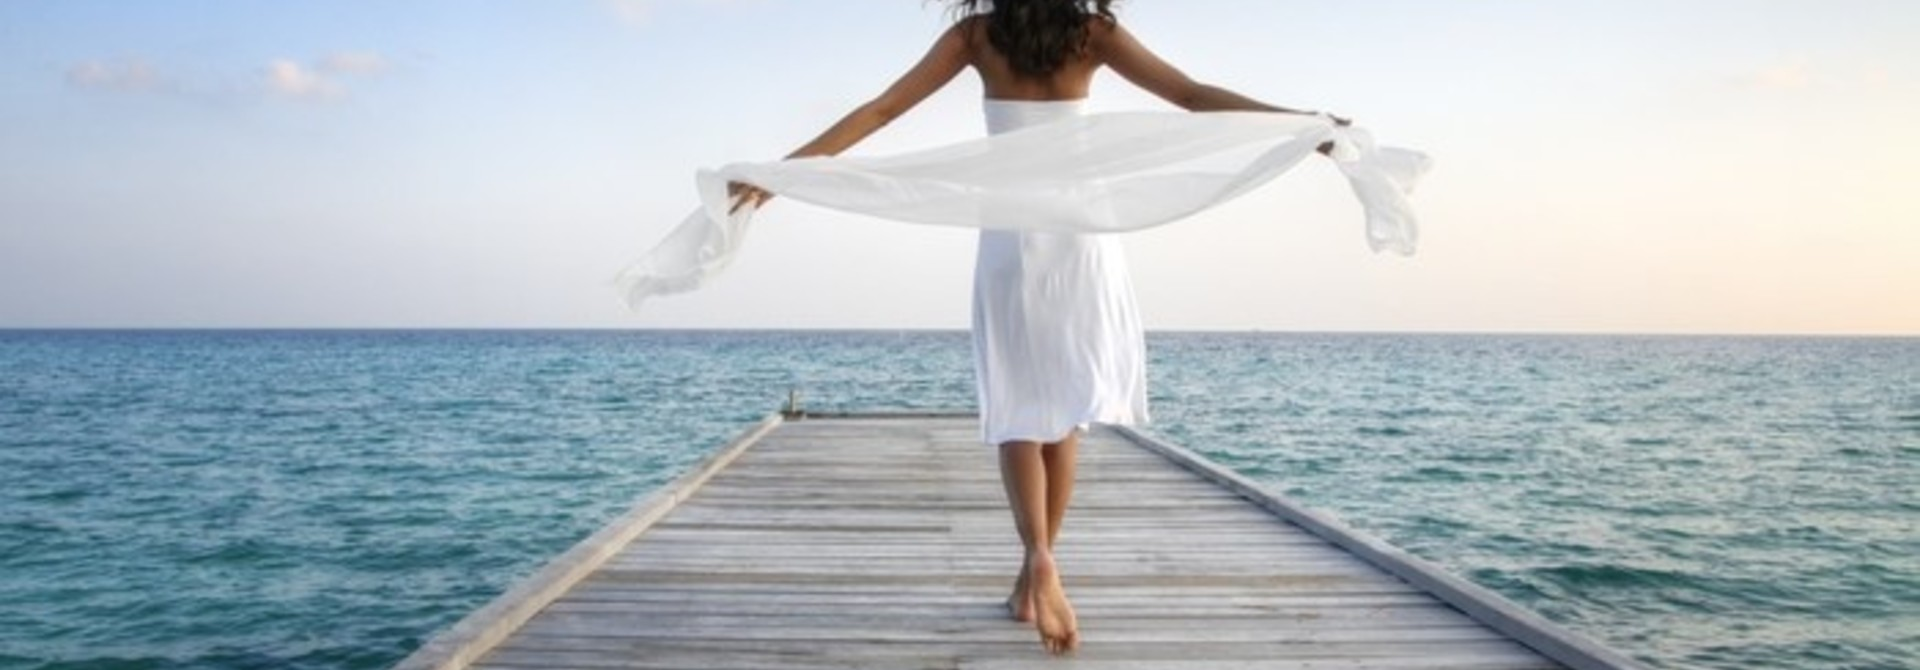 Skin Kit Anti-Aging Huidverzorging